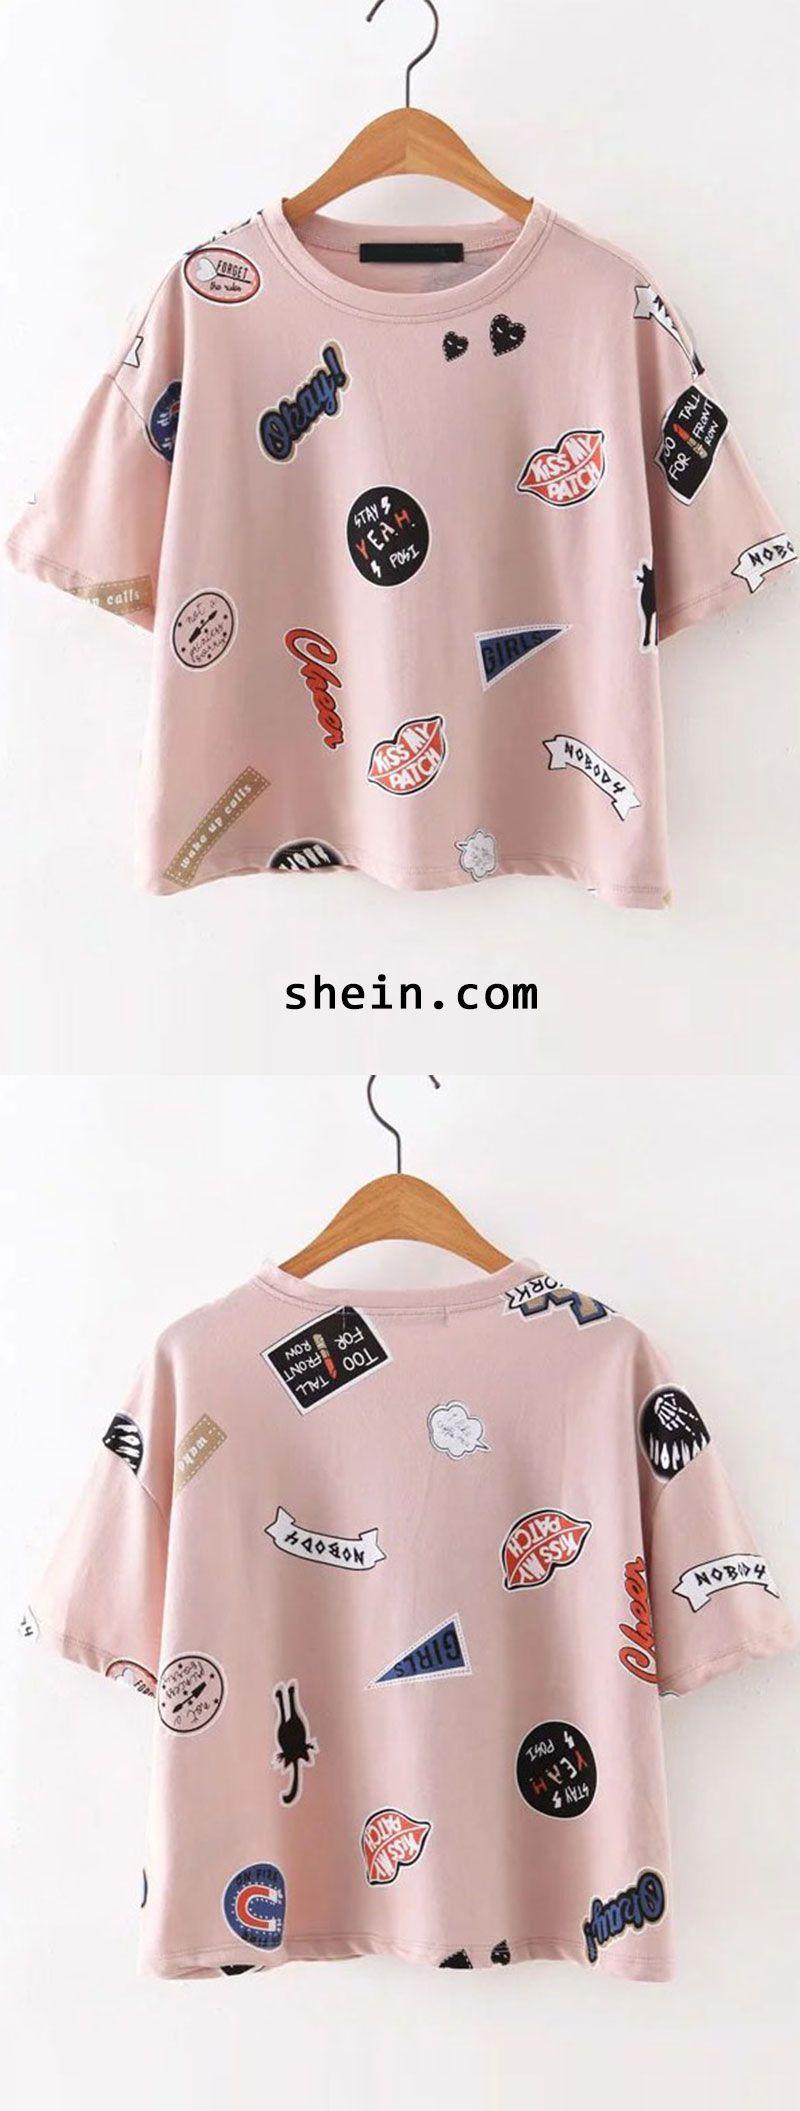 Pink Round Neck Printed Short Sleeve T-Shirt